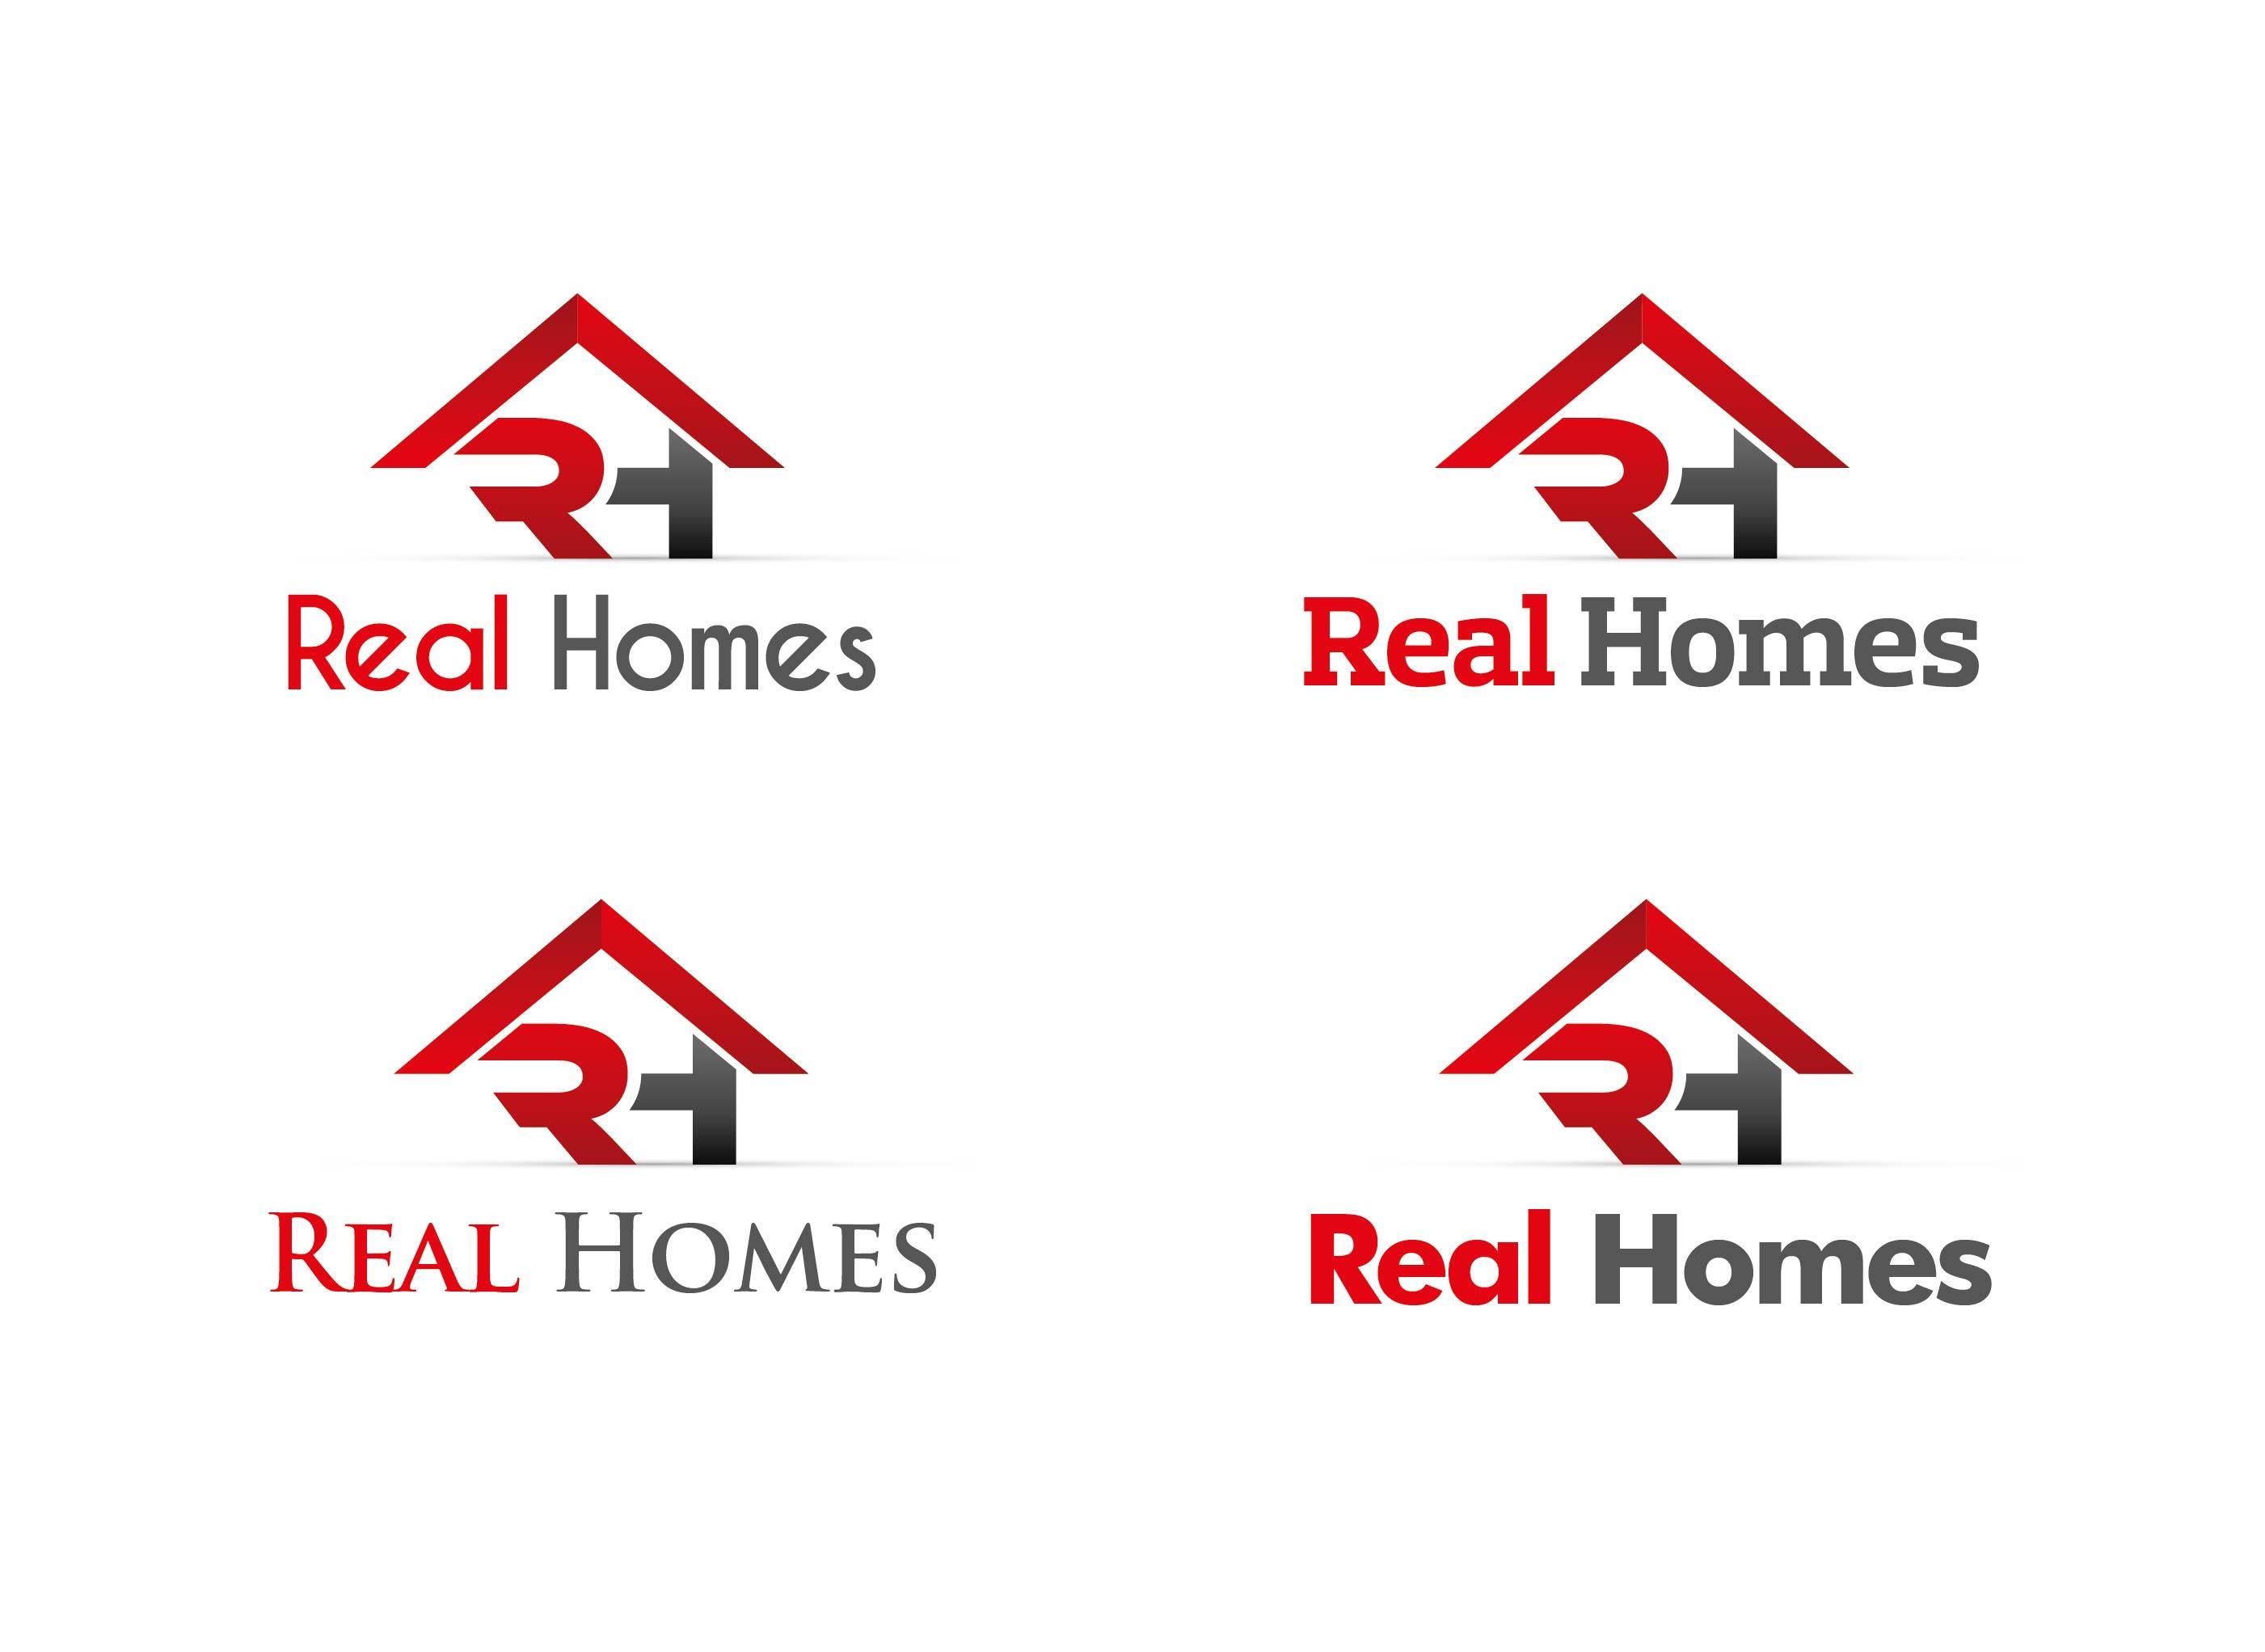 Logo Design by Adnan Taqi - Entry No. 84 in the Logo Design Contest Captivating Logo Design for Real Homes.